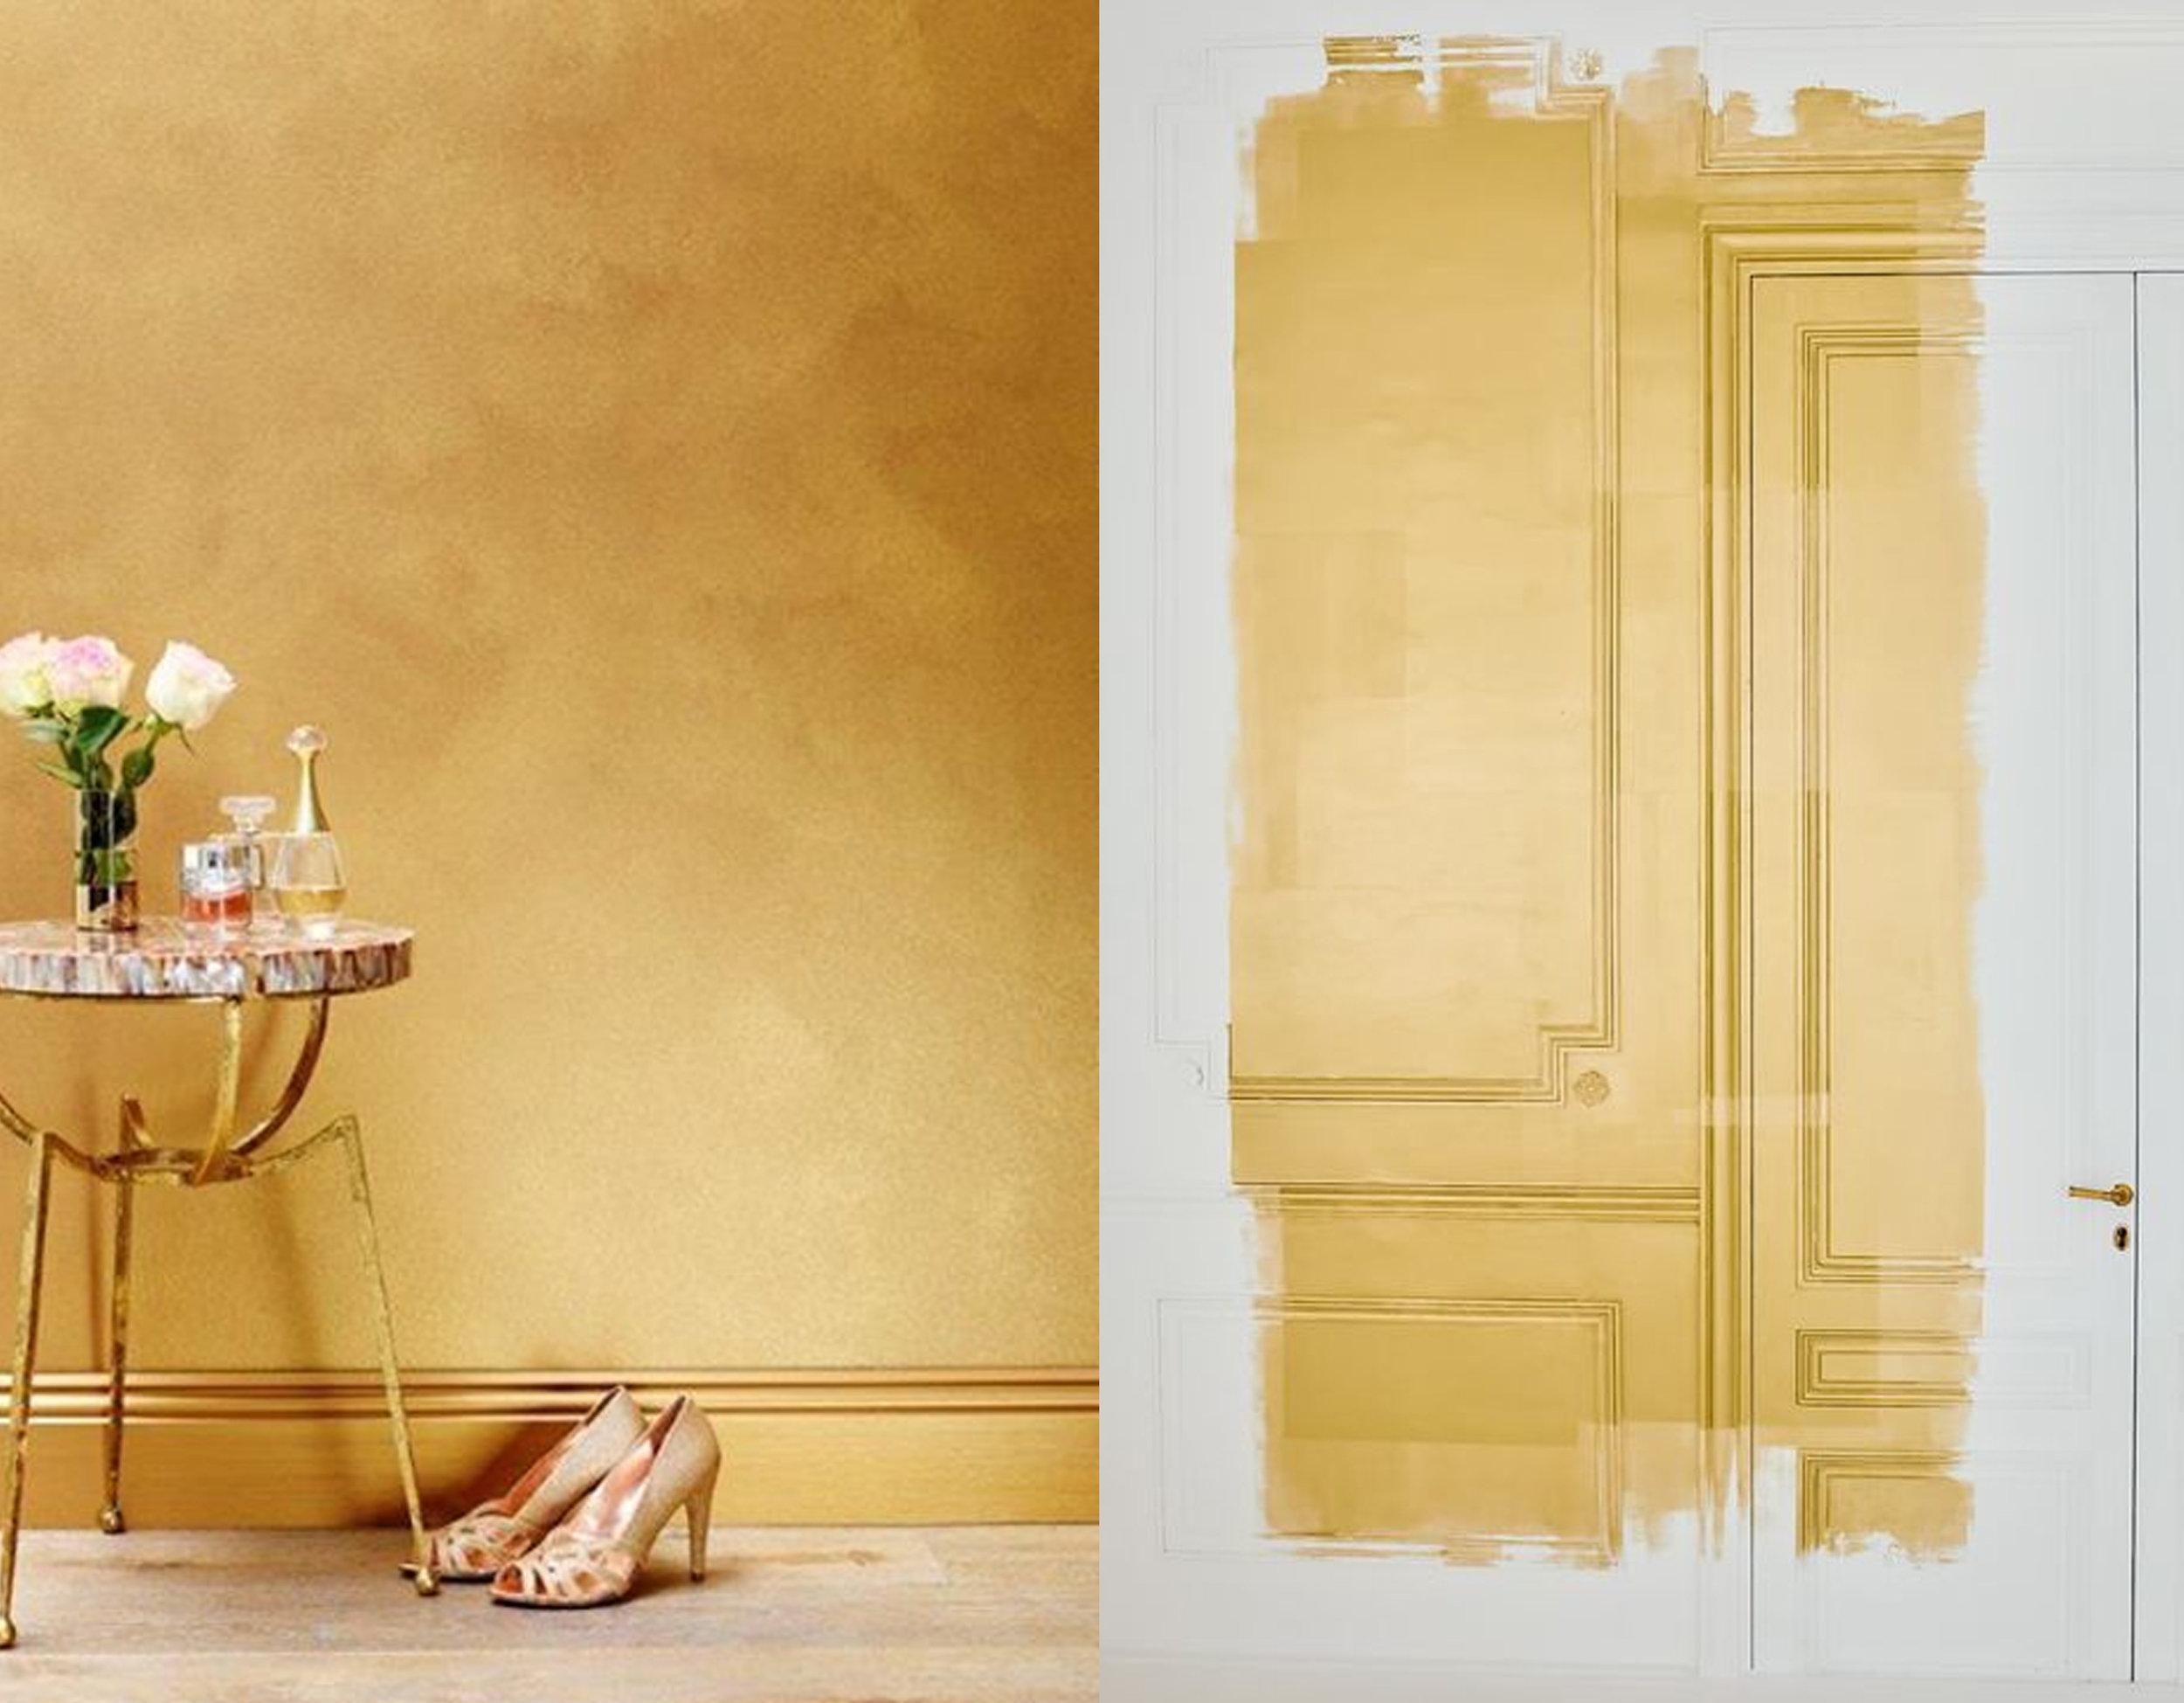 metalic paints Liquid Gold  Syndney Harbour  - paint brings details more in front photography Elizaveta Porodina via  Zsa Zsa Bellagio